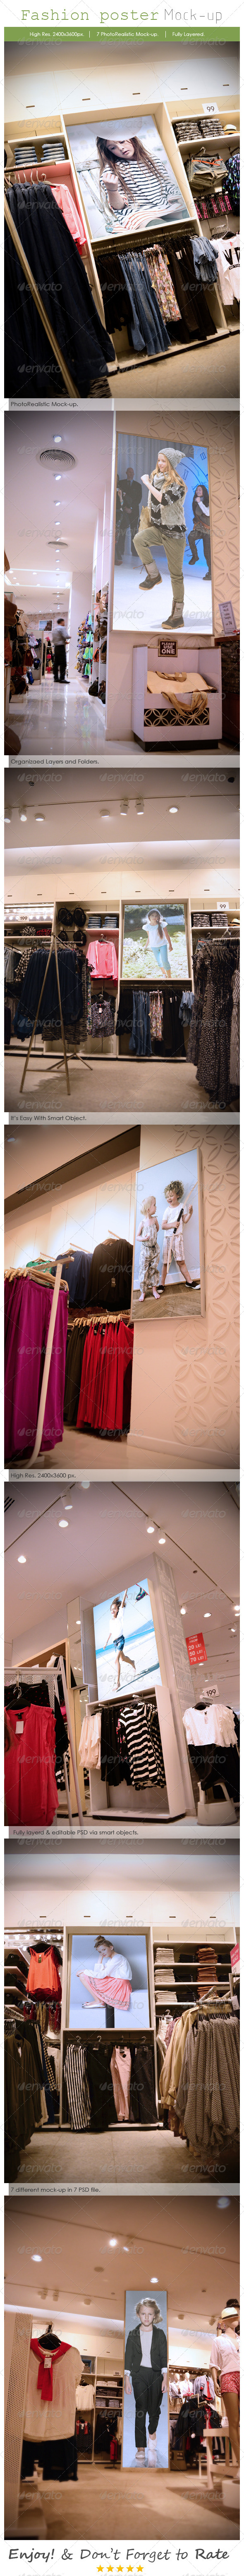 Fashion Poster Mockup - Print Product Mock-Ups